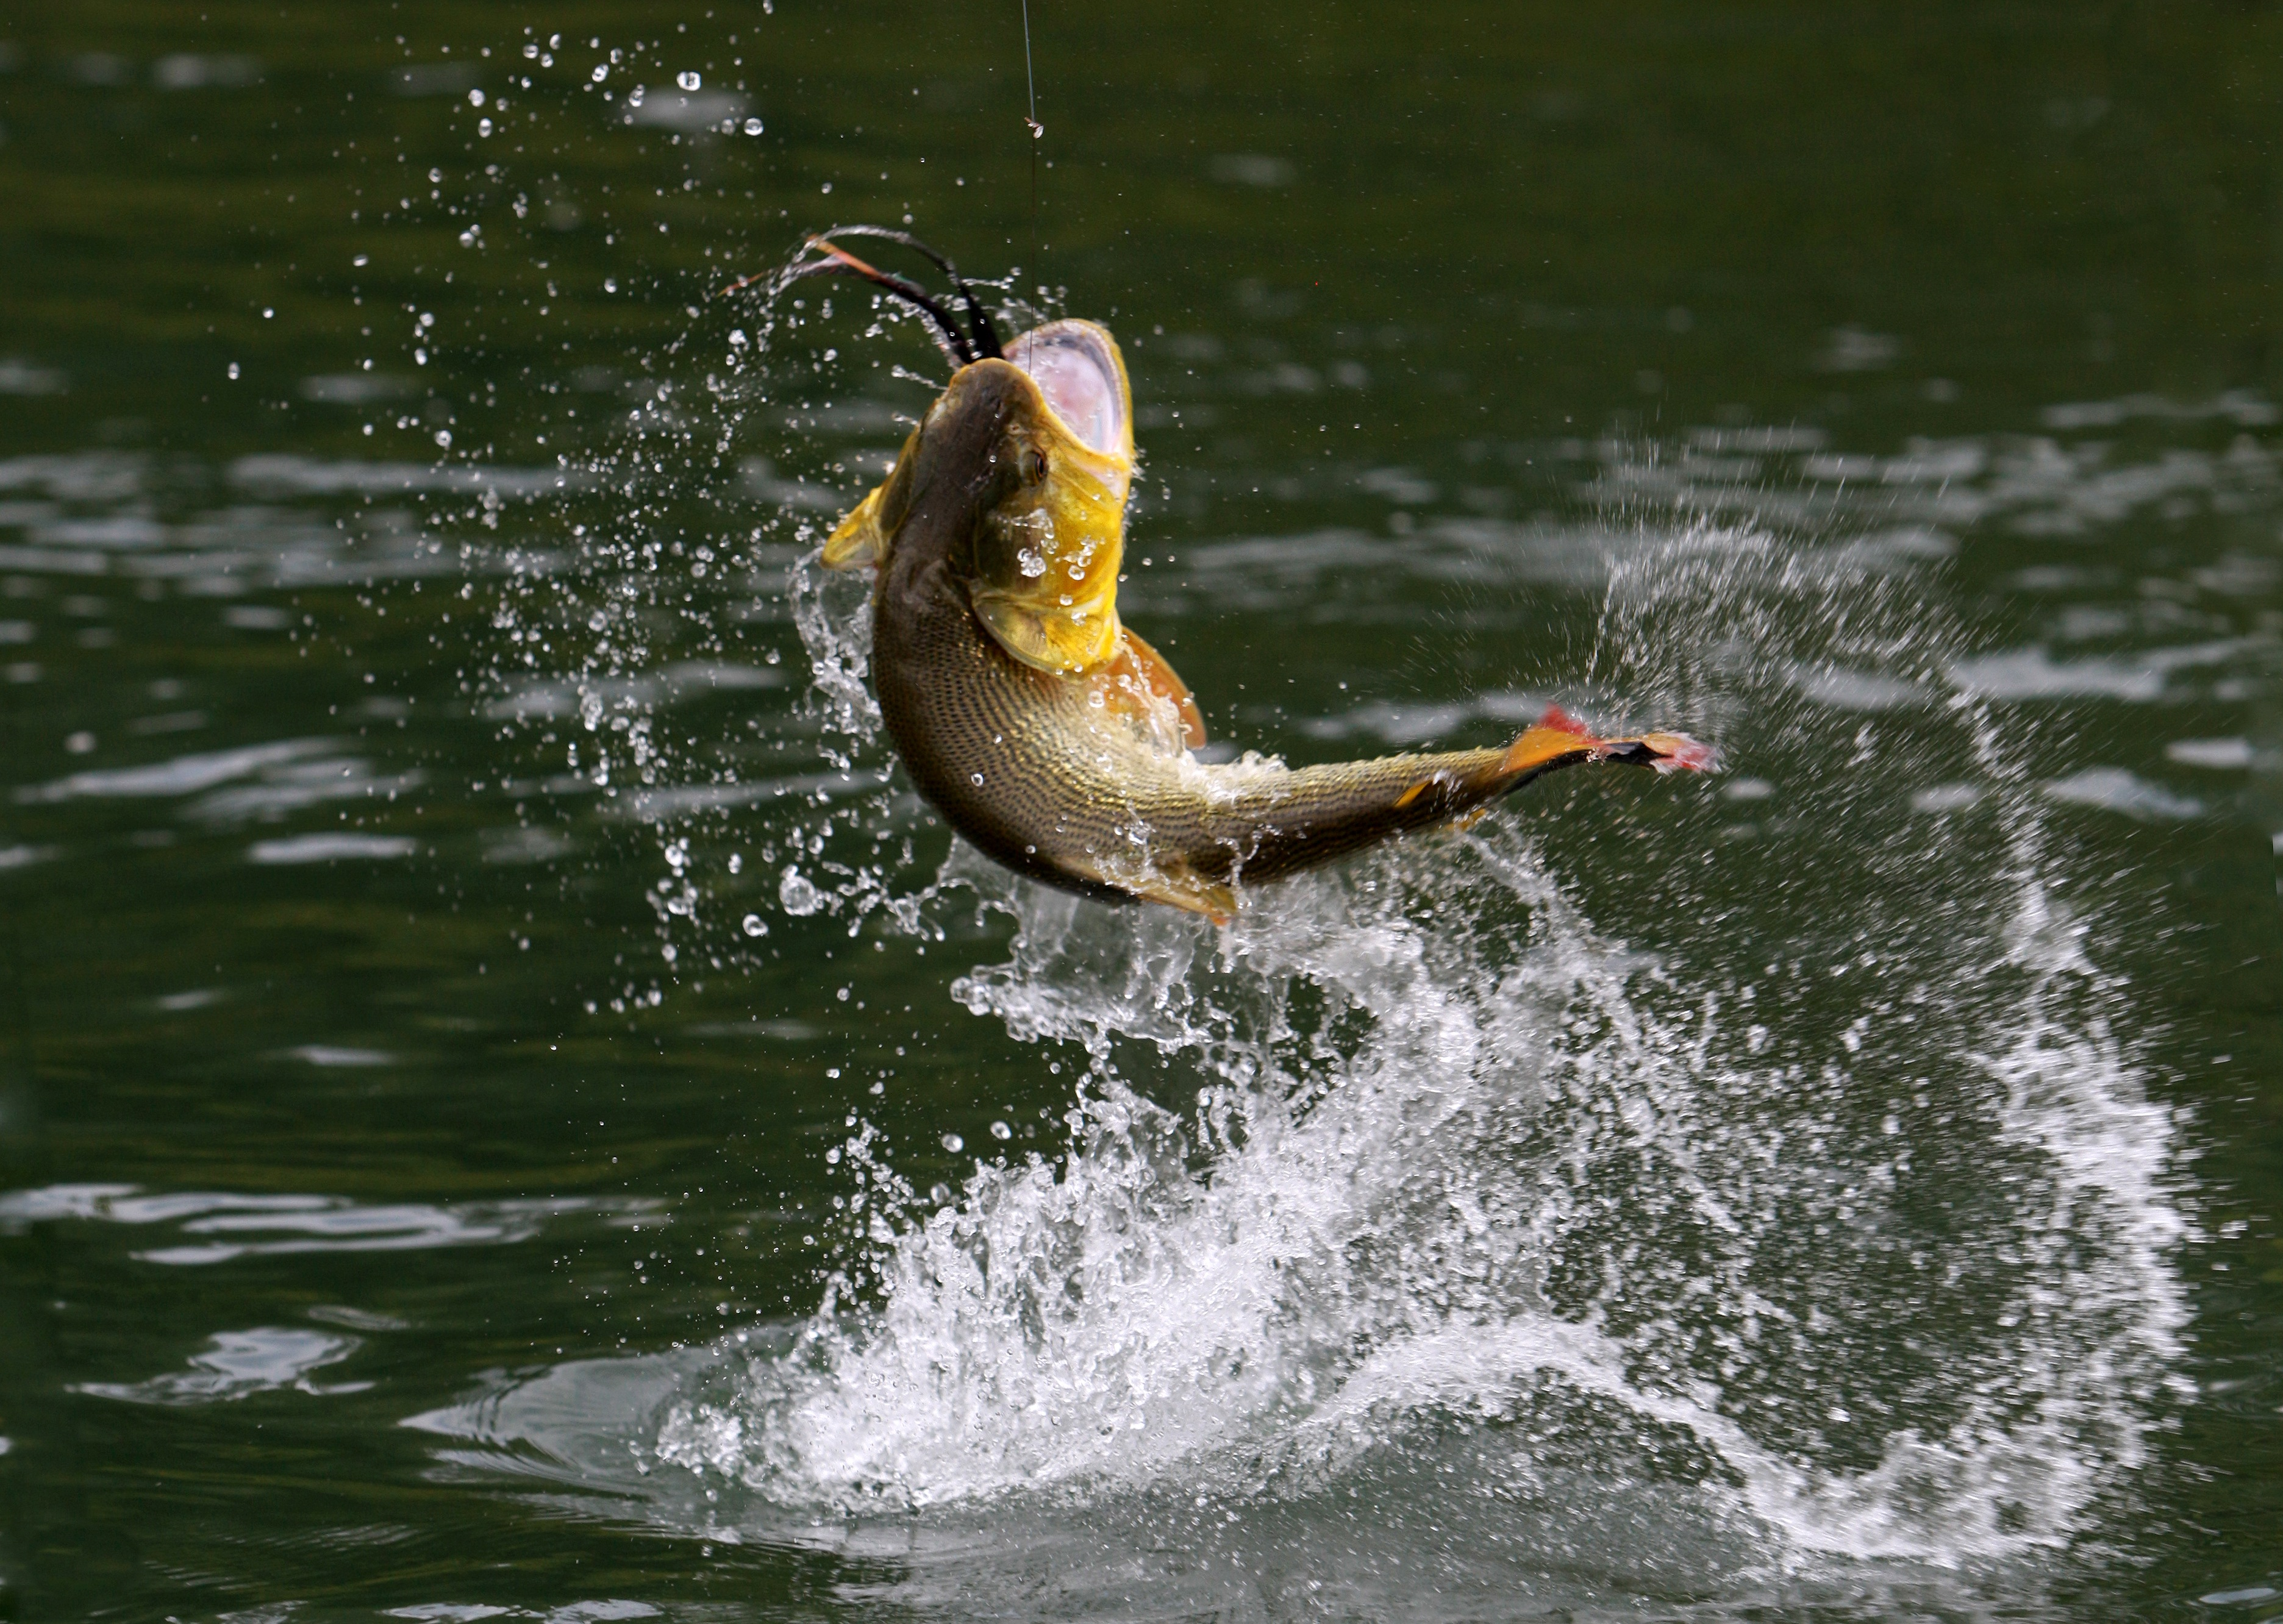 Bass fish fishing drops g wallpaper 3744x2664 195799 for Fishing videos bass